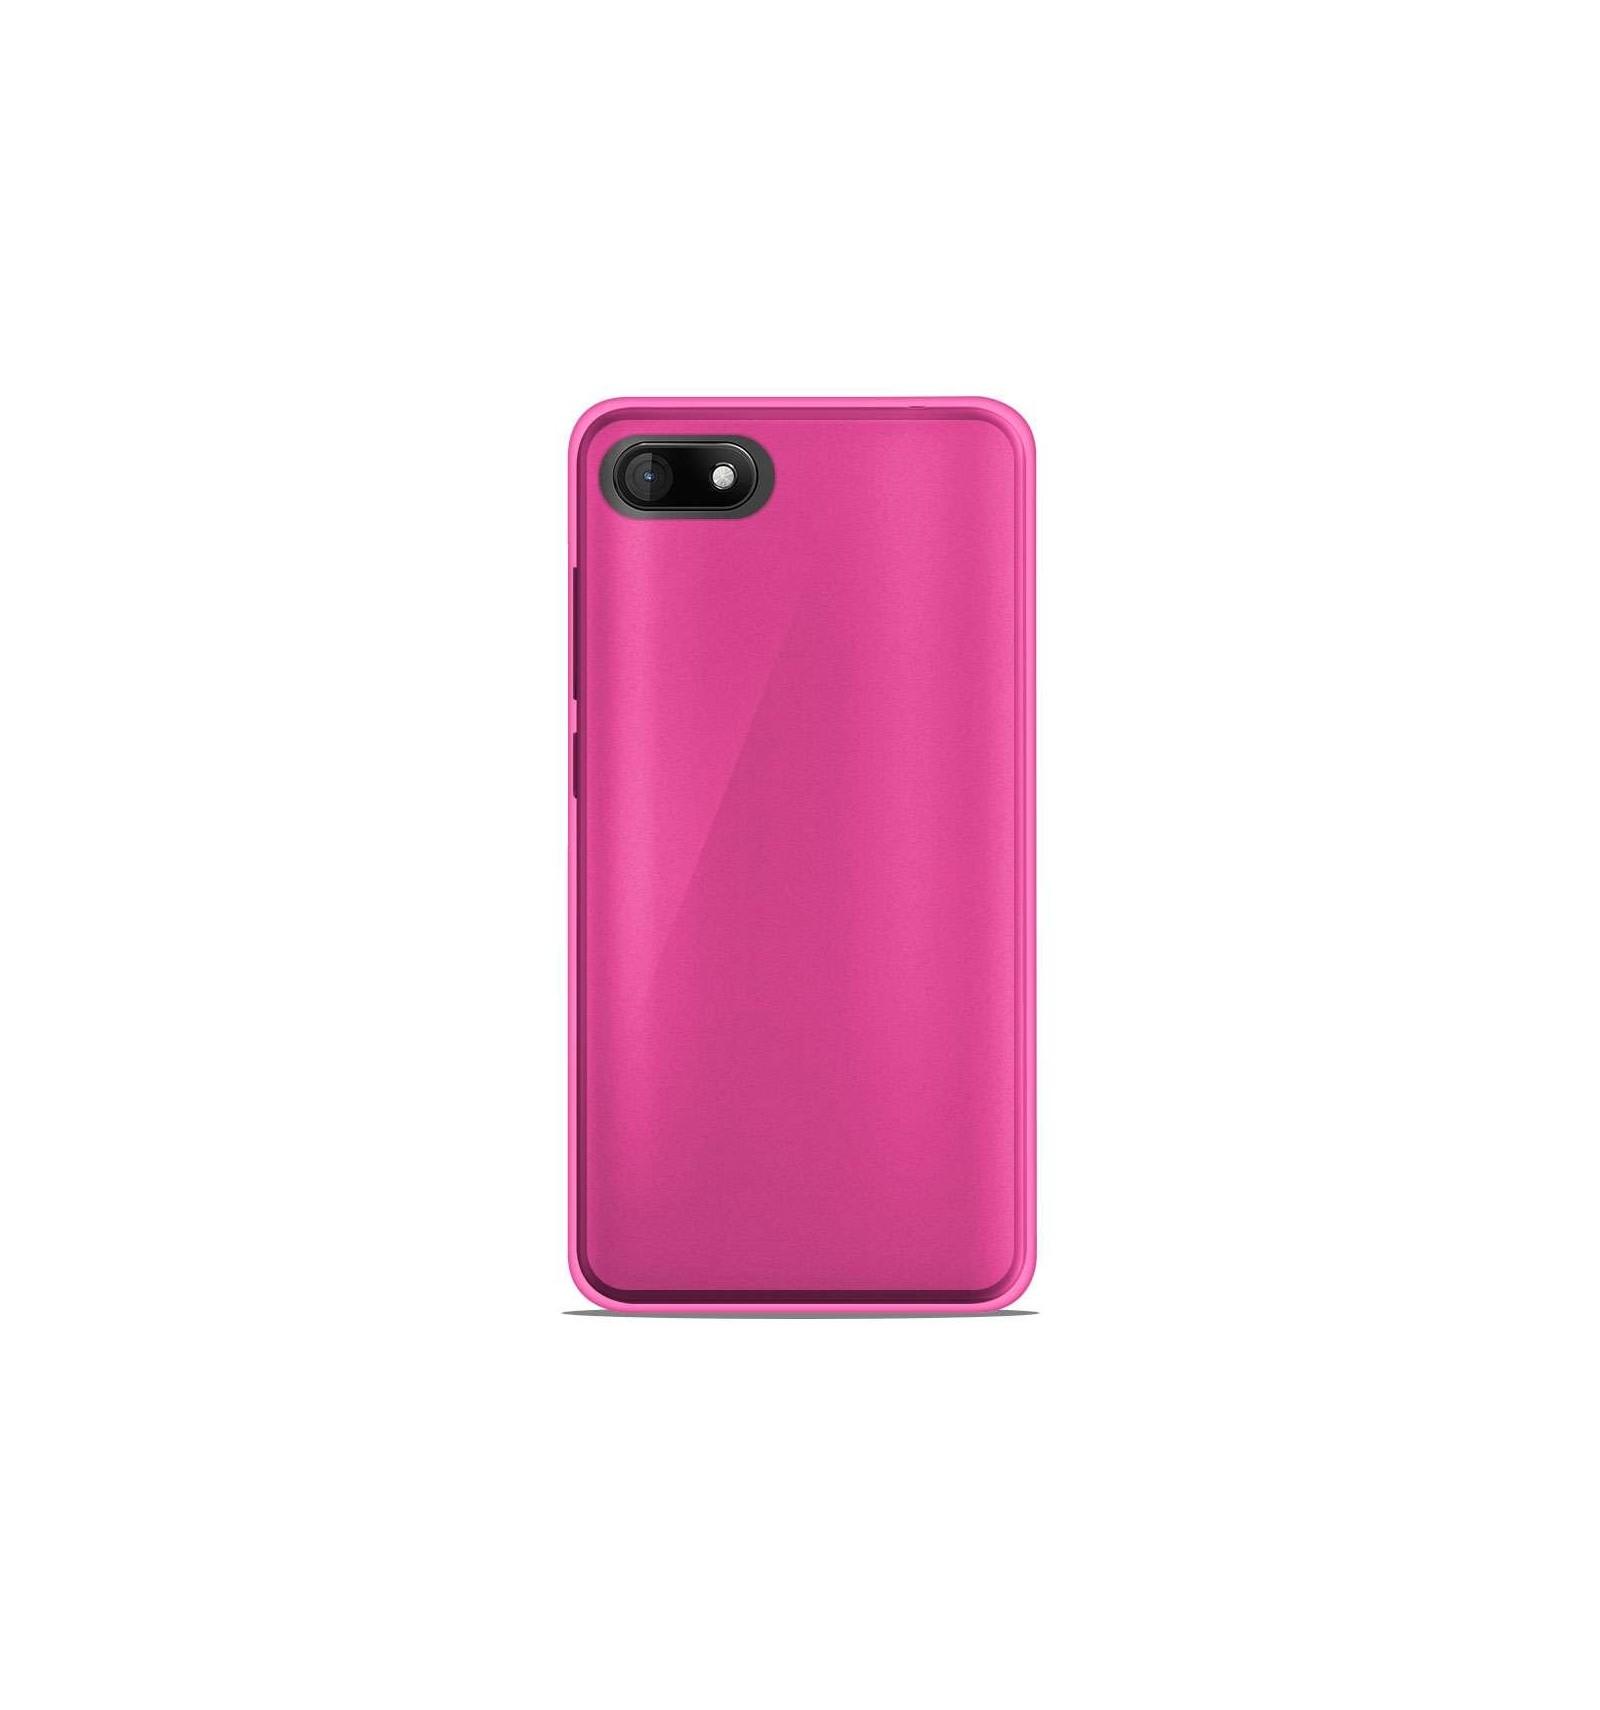 Coque Wiko Sunny 3 Silicone Gel givré - Rose Translucide